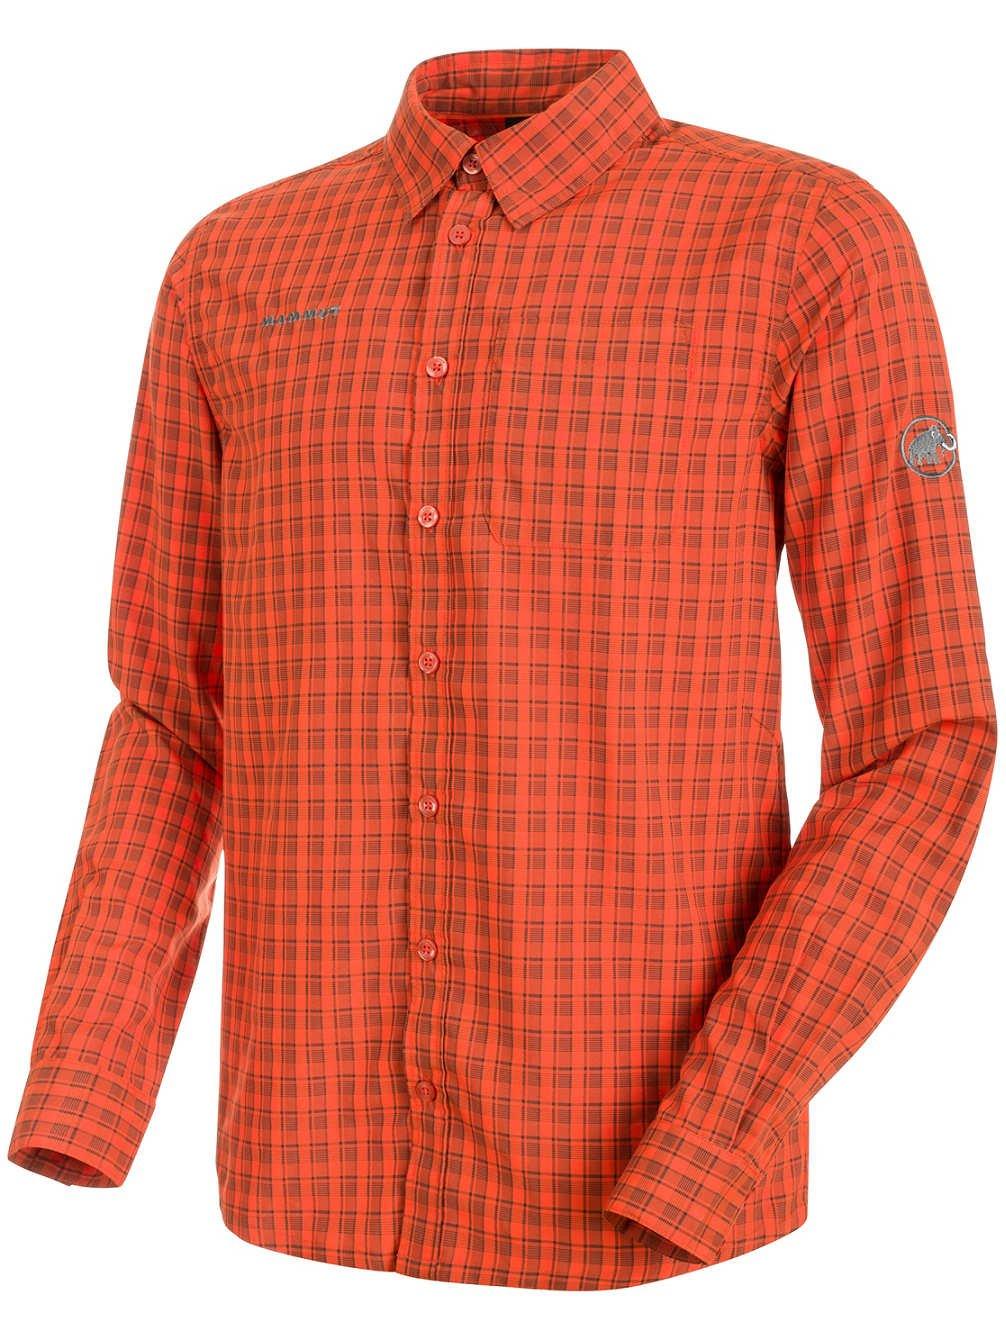 Mammut Herren Langarm-Hemd Lenni T-Shirts